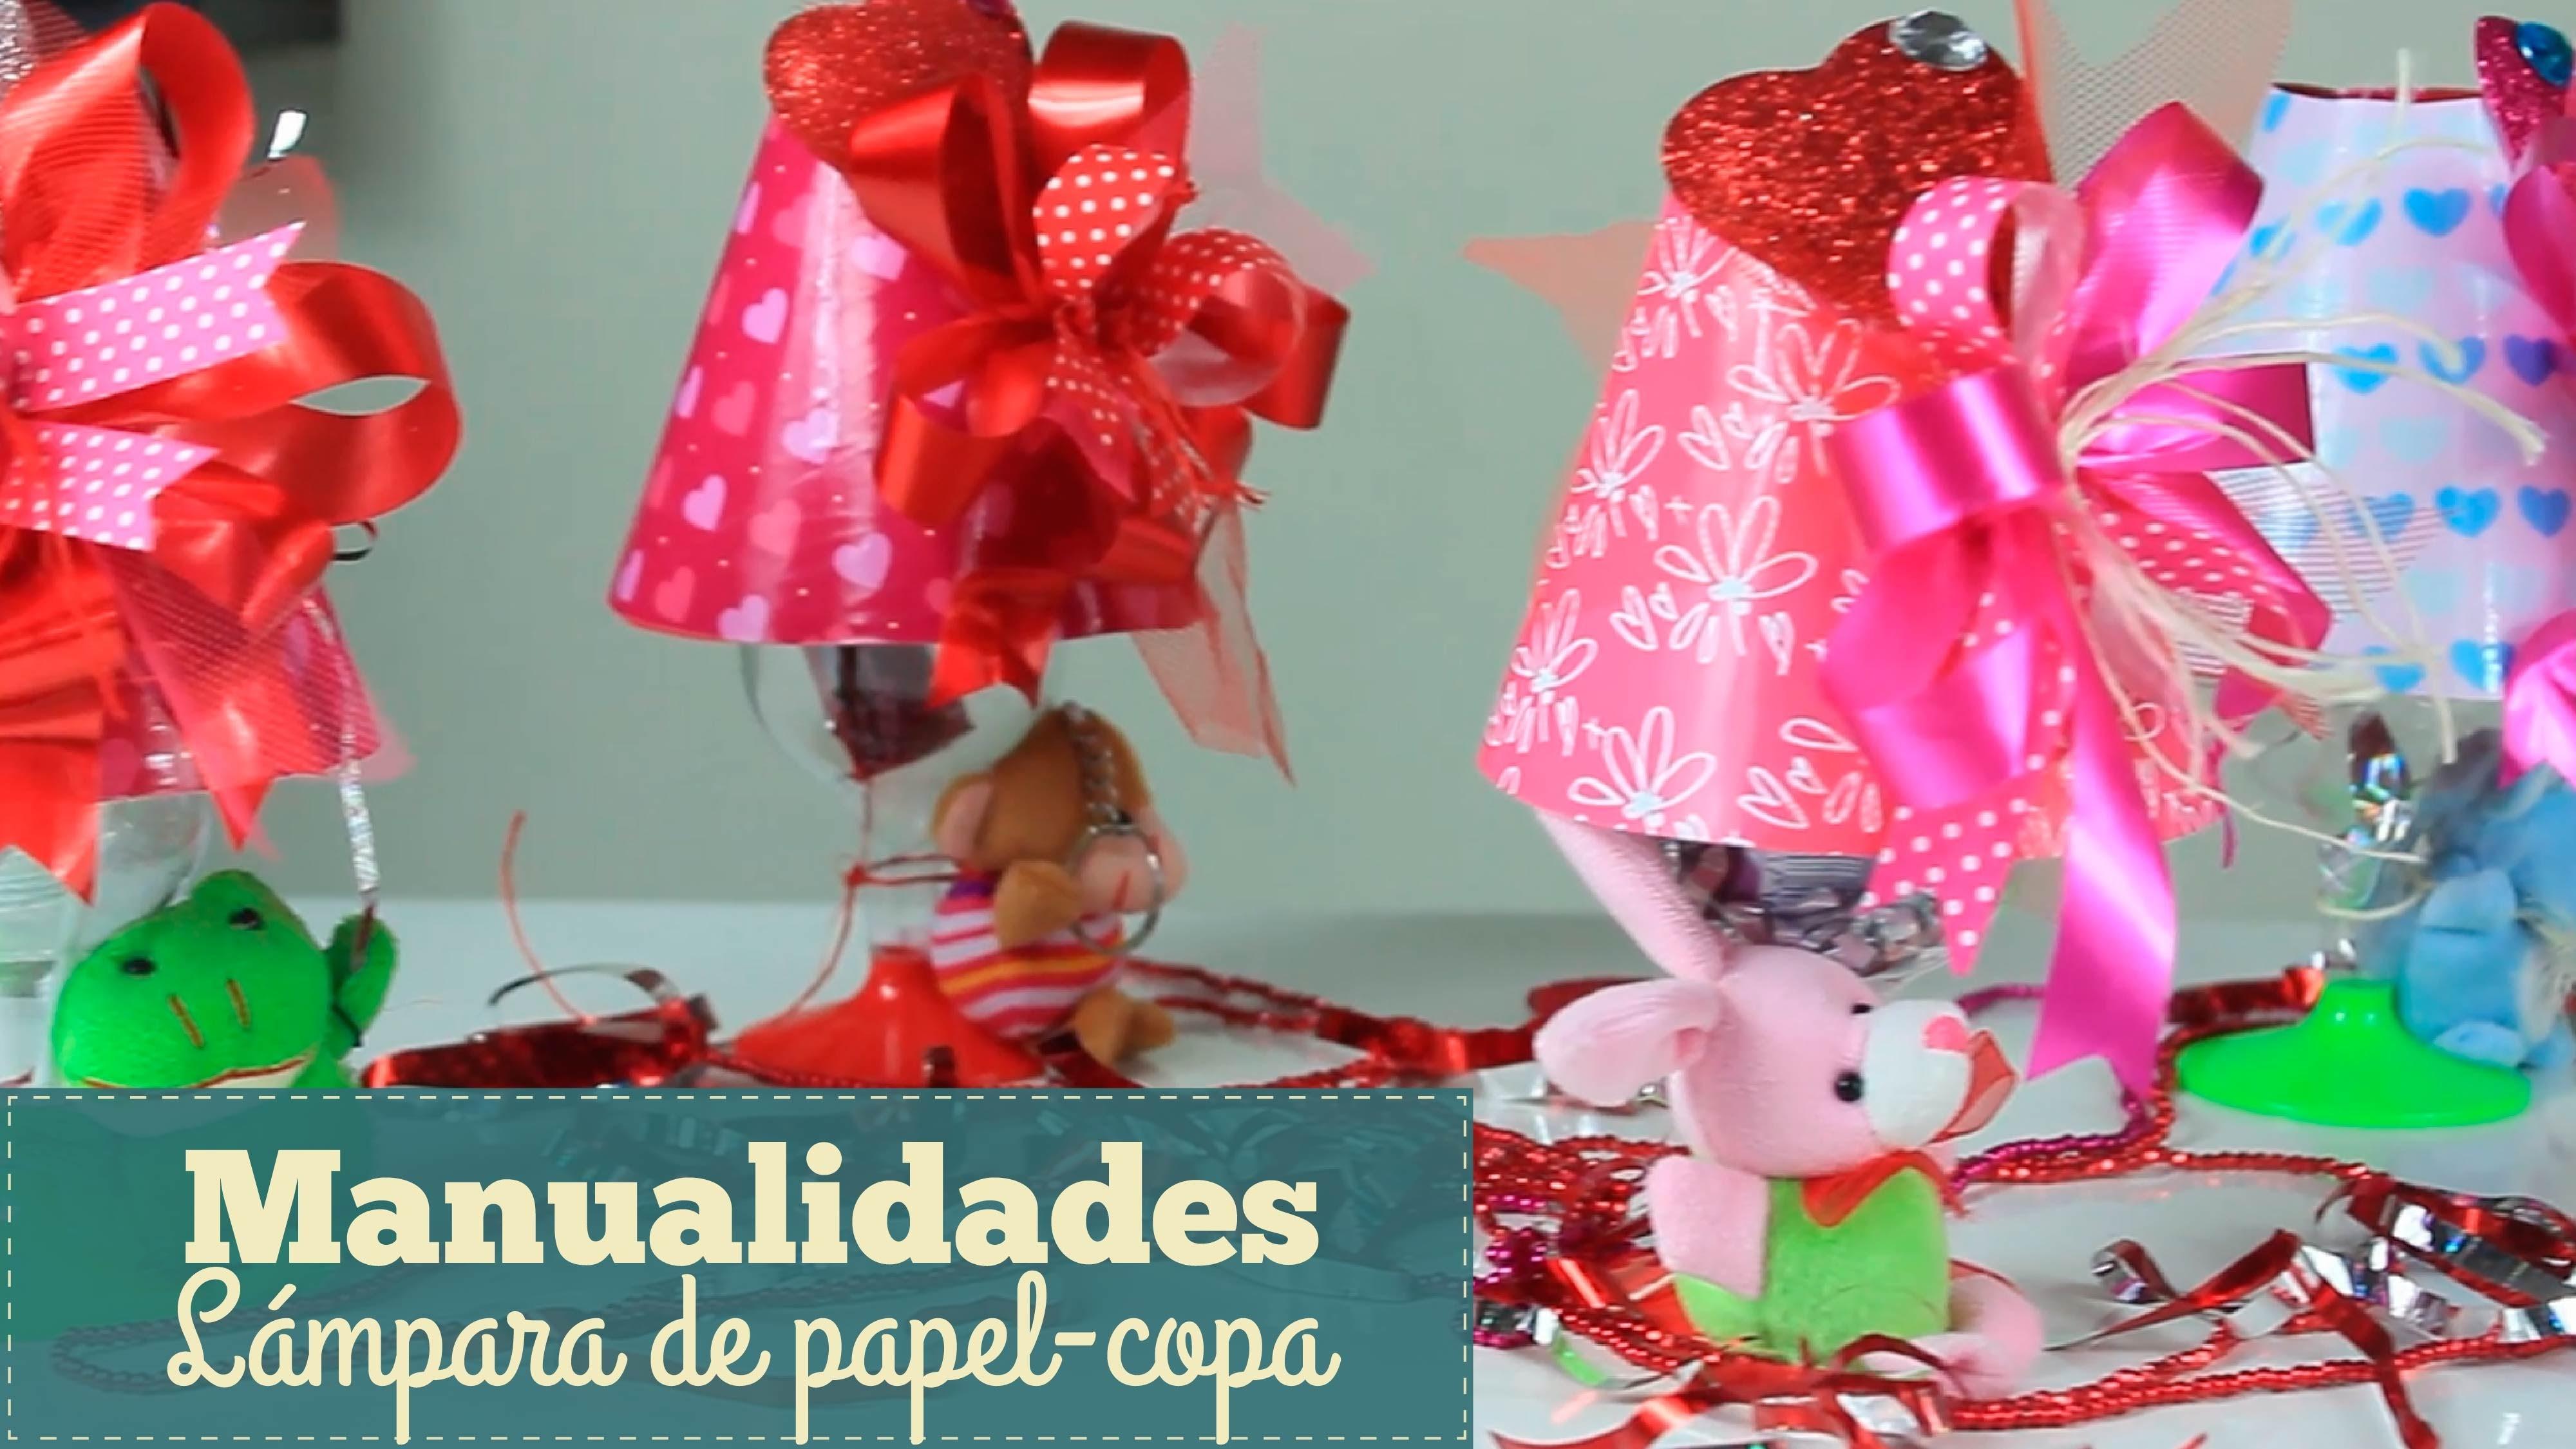 MANUALIDADES LÁMPARA DE PAPEL-COPA.CRAFTS PAPER-CUP LAMP